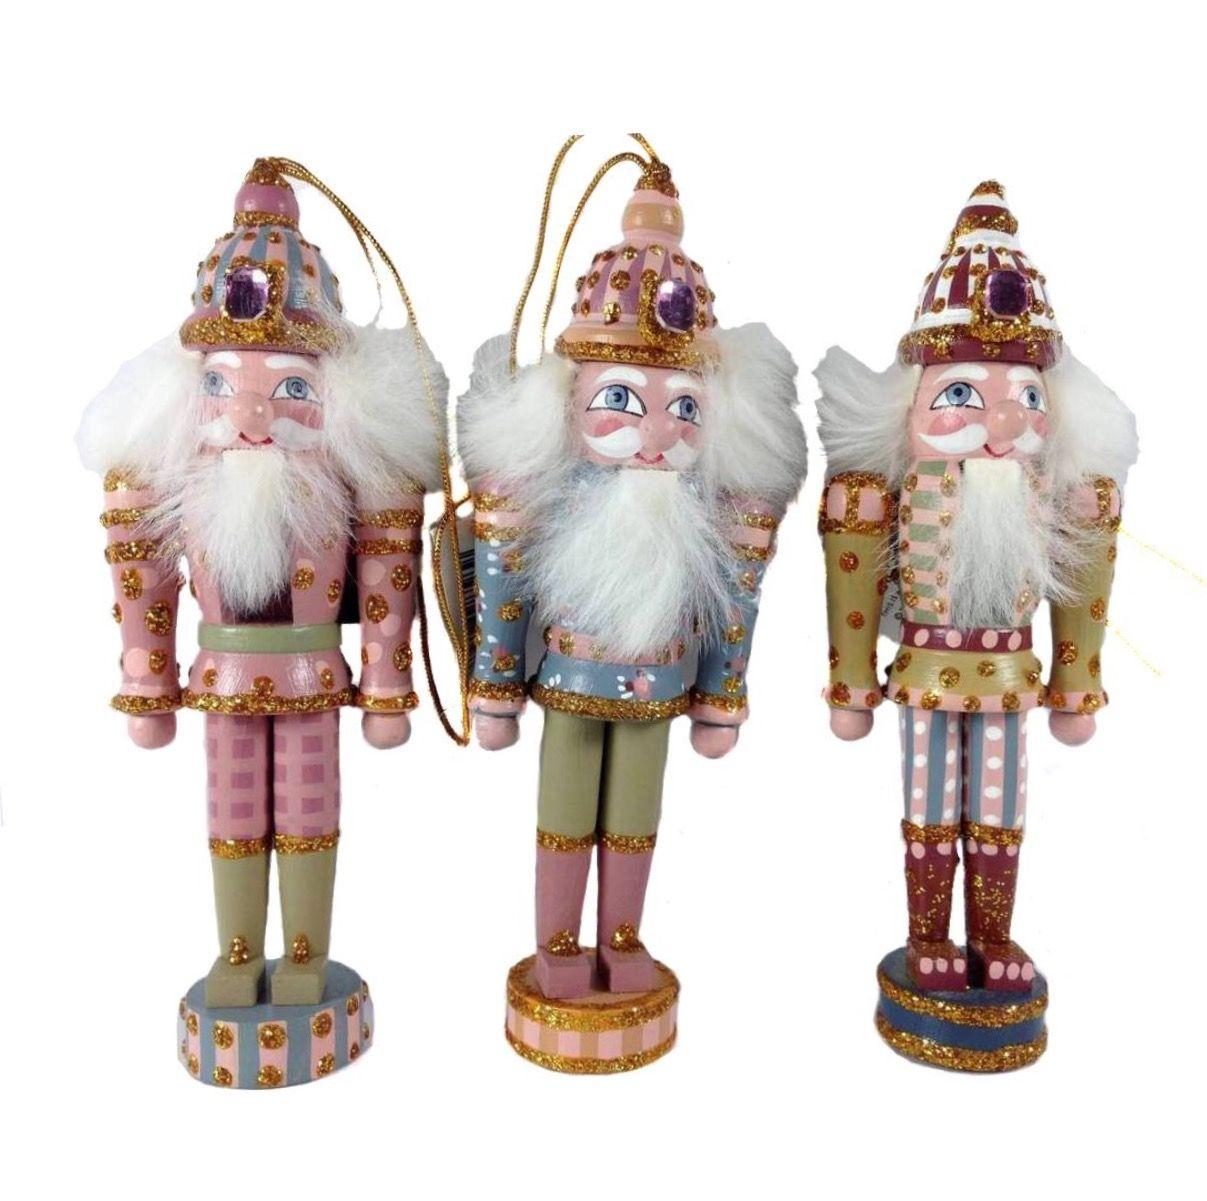 ✓ Kurt Adler 3 Assorted Nutcracker Ornaments H0799. Kurt S. Adler ...